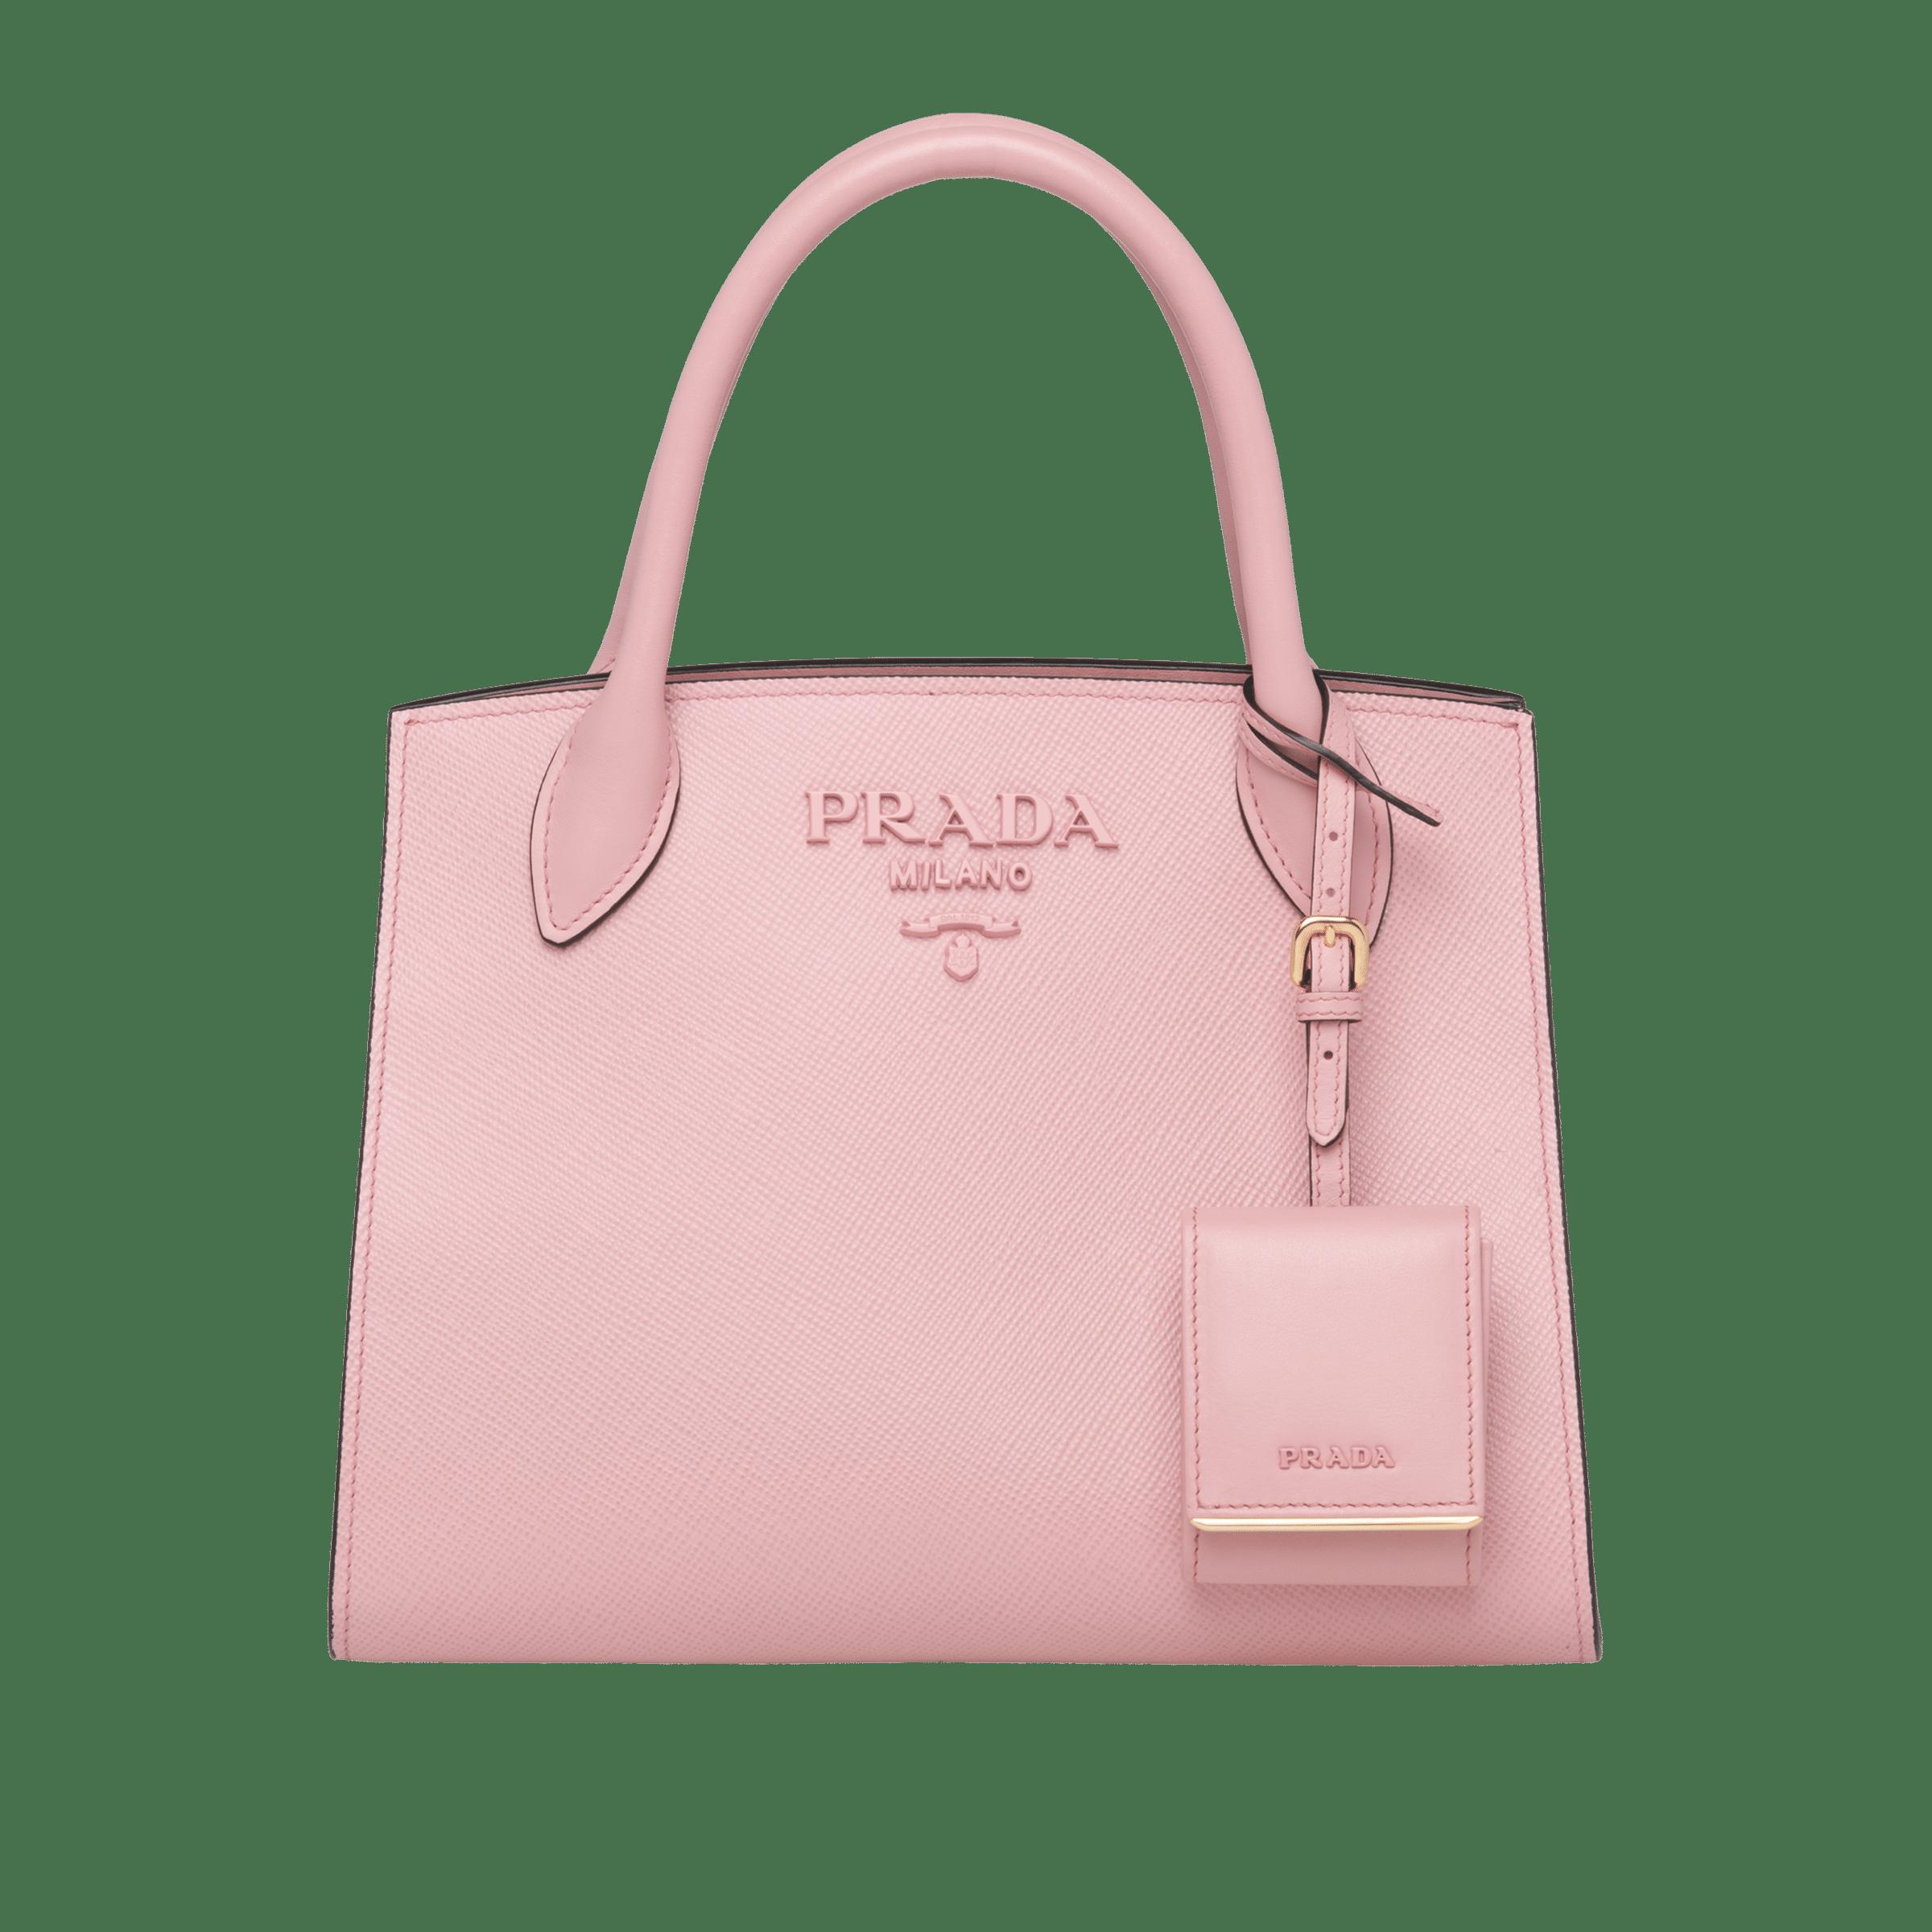 695a0b4aa95b Prada Monochrome Saffiano leather bag | Prada - 1BA156_2ERX_F0924_V_OOO